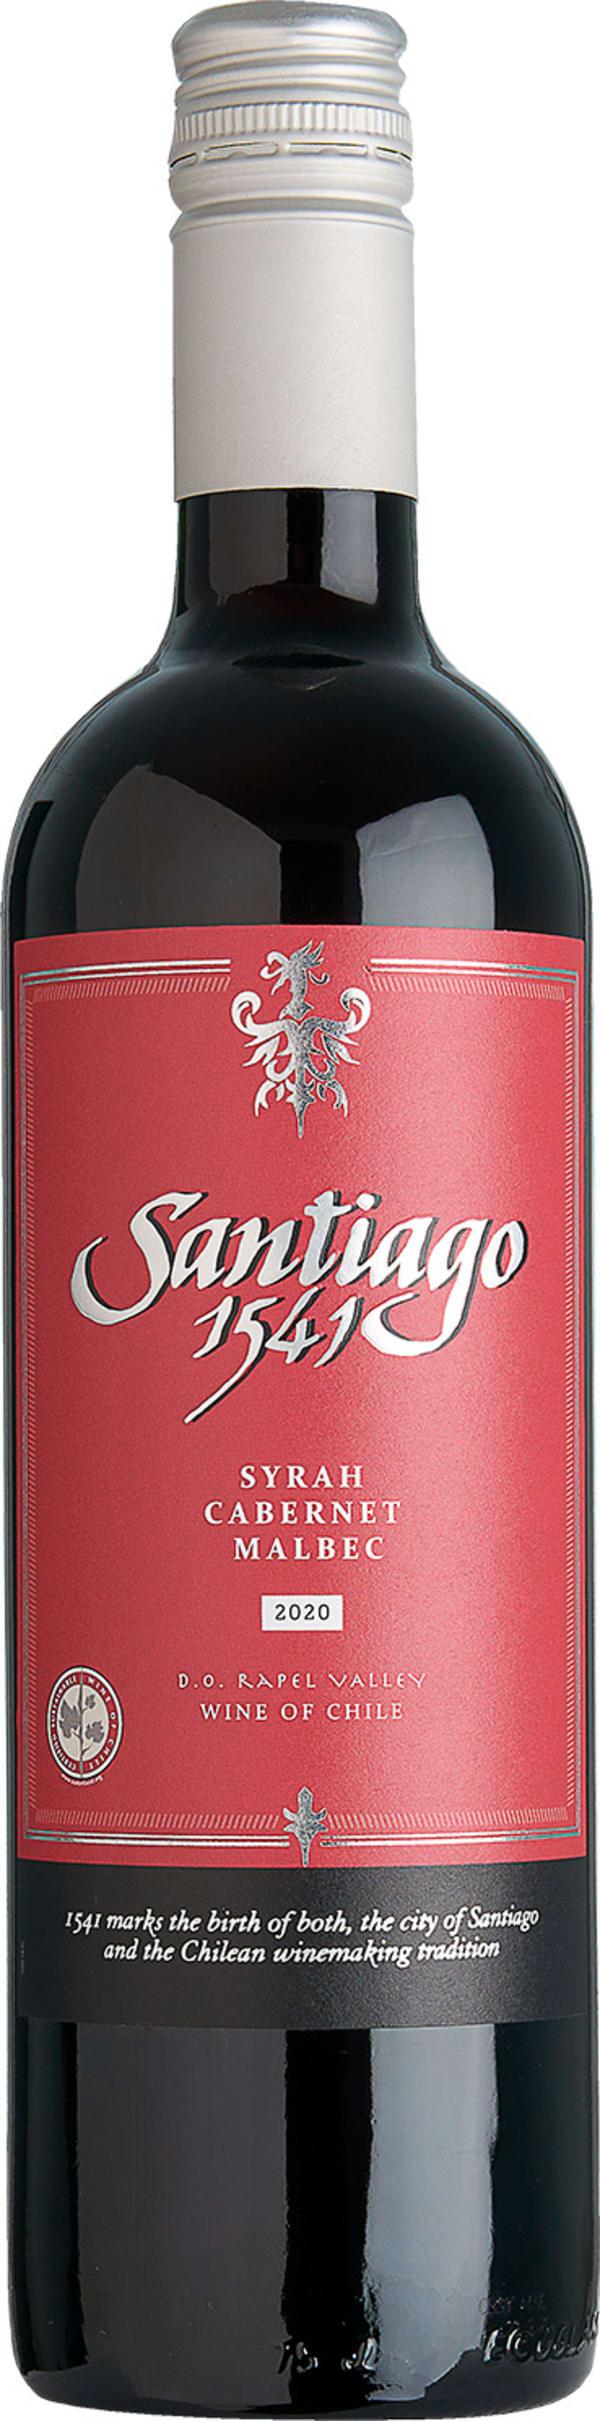 Santiago 1541 Syrah Cabernet Malbec 2019